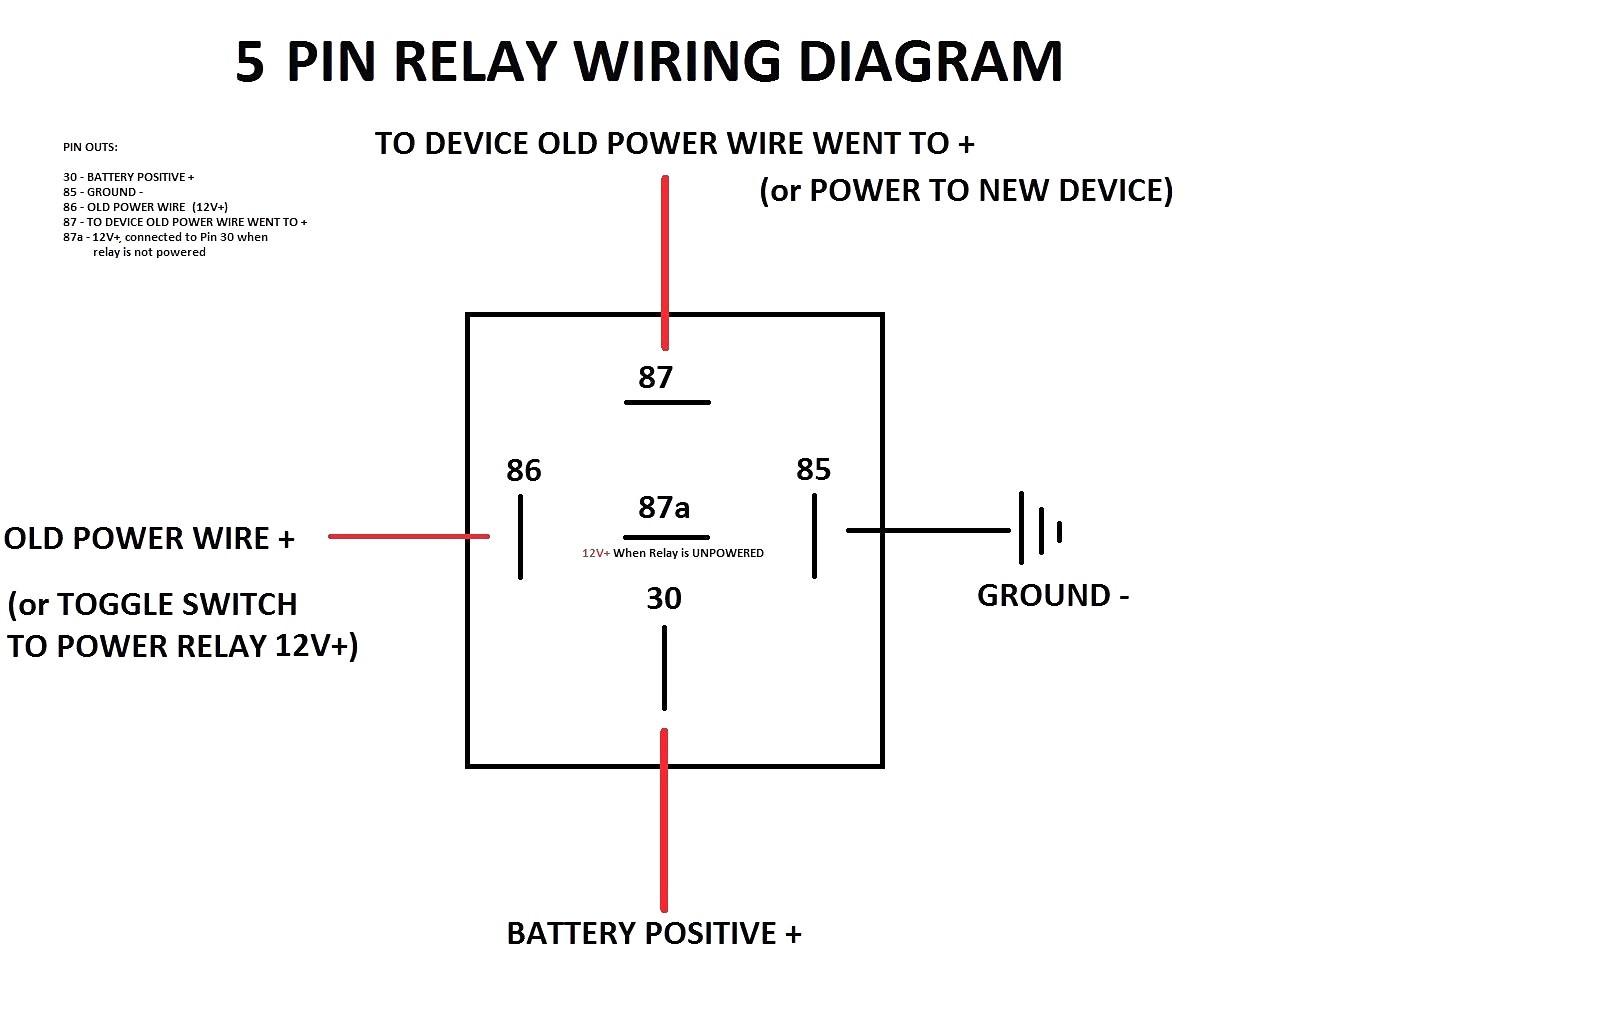 5 Pin Relay Wiring Diagram Carlplant Endearing Enchanting 4 For 2 Flasher